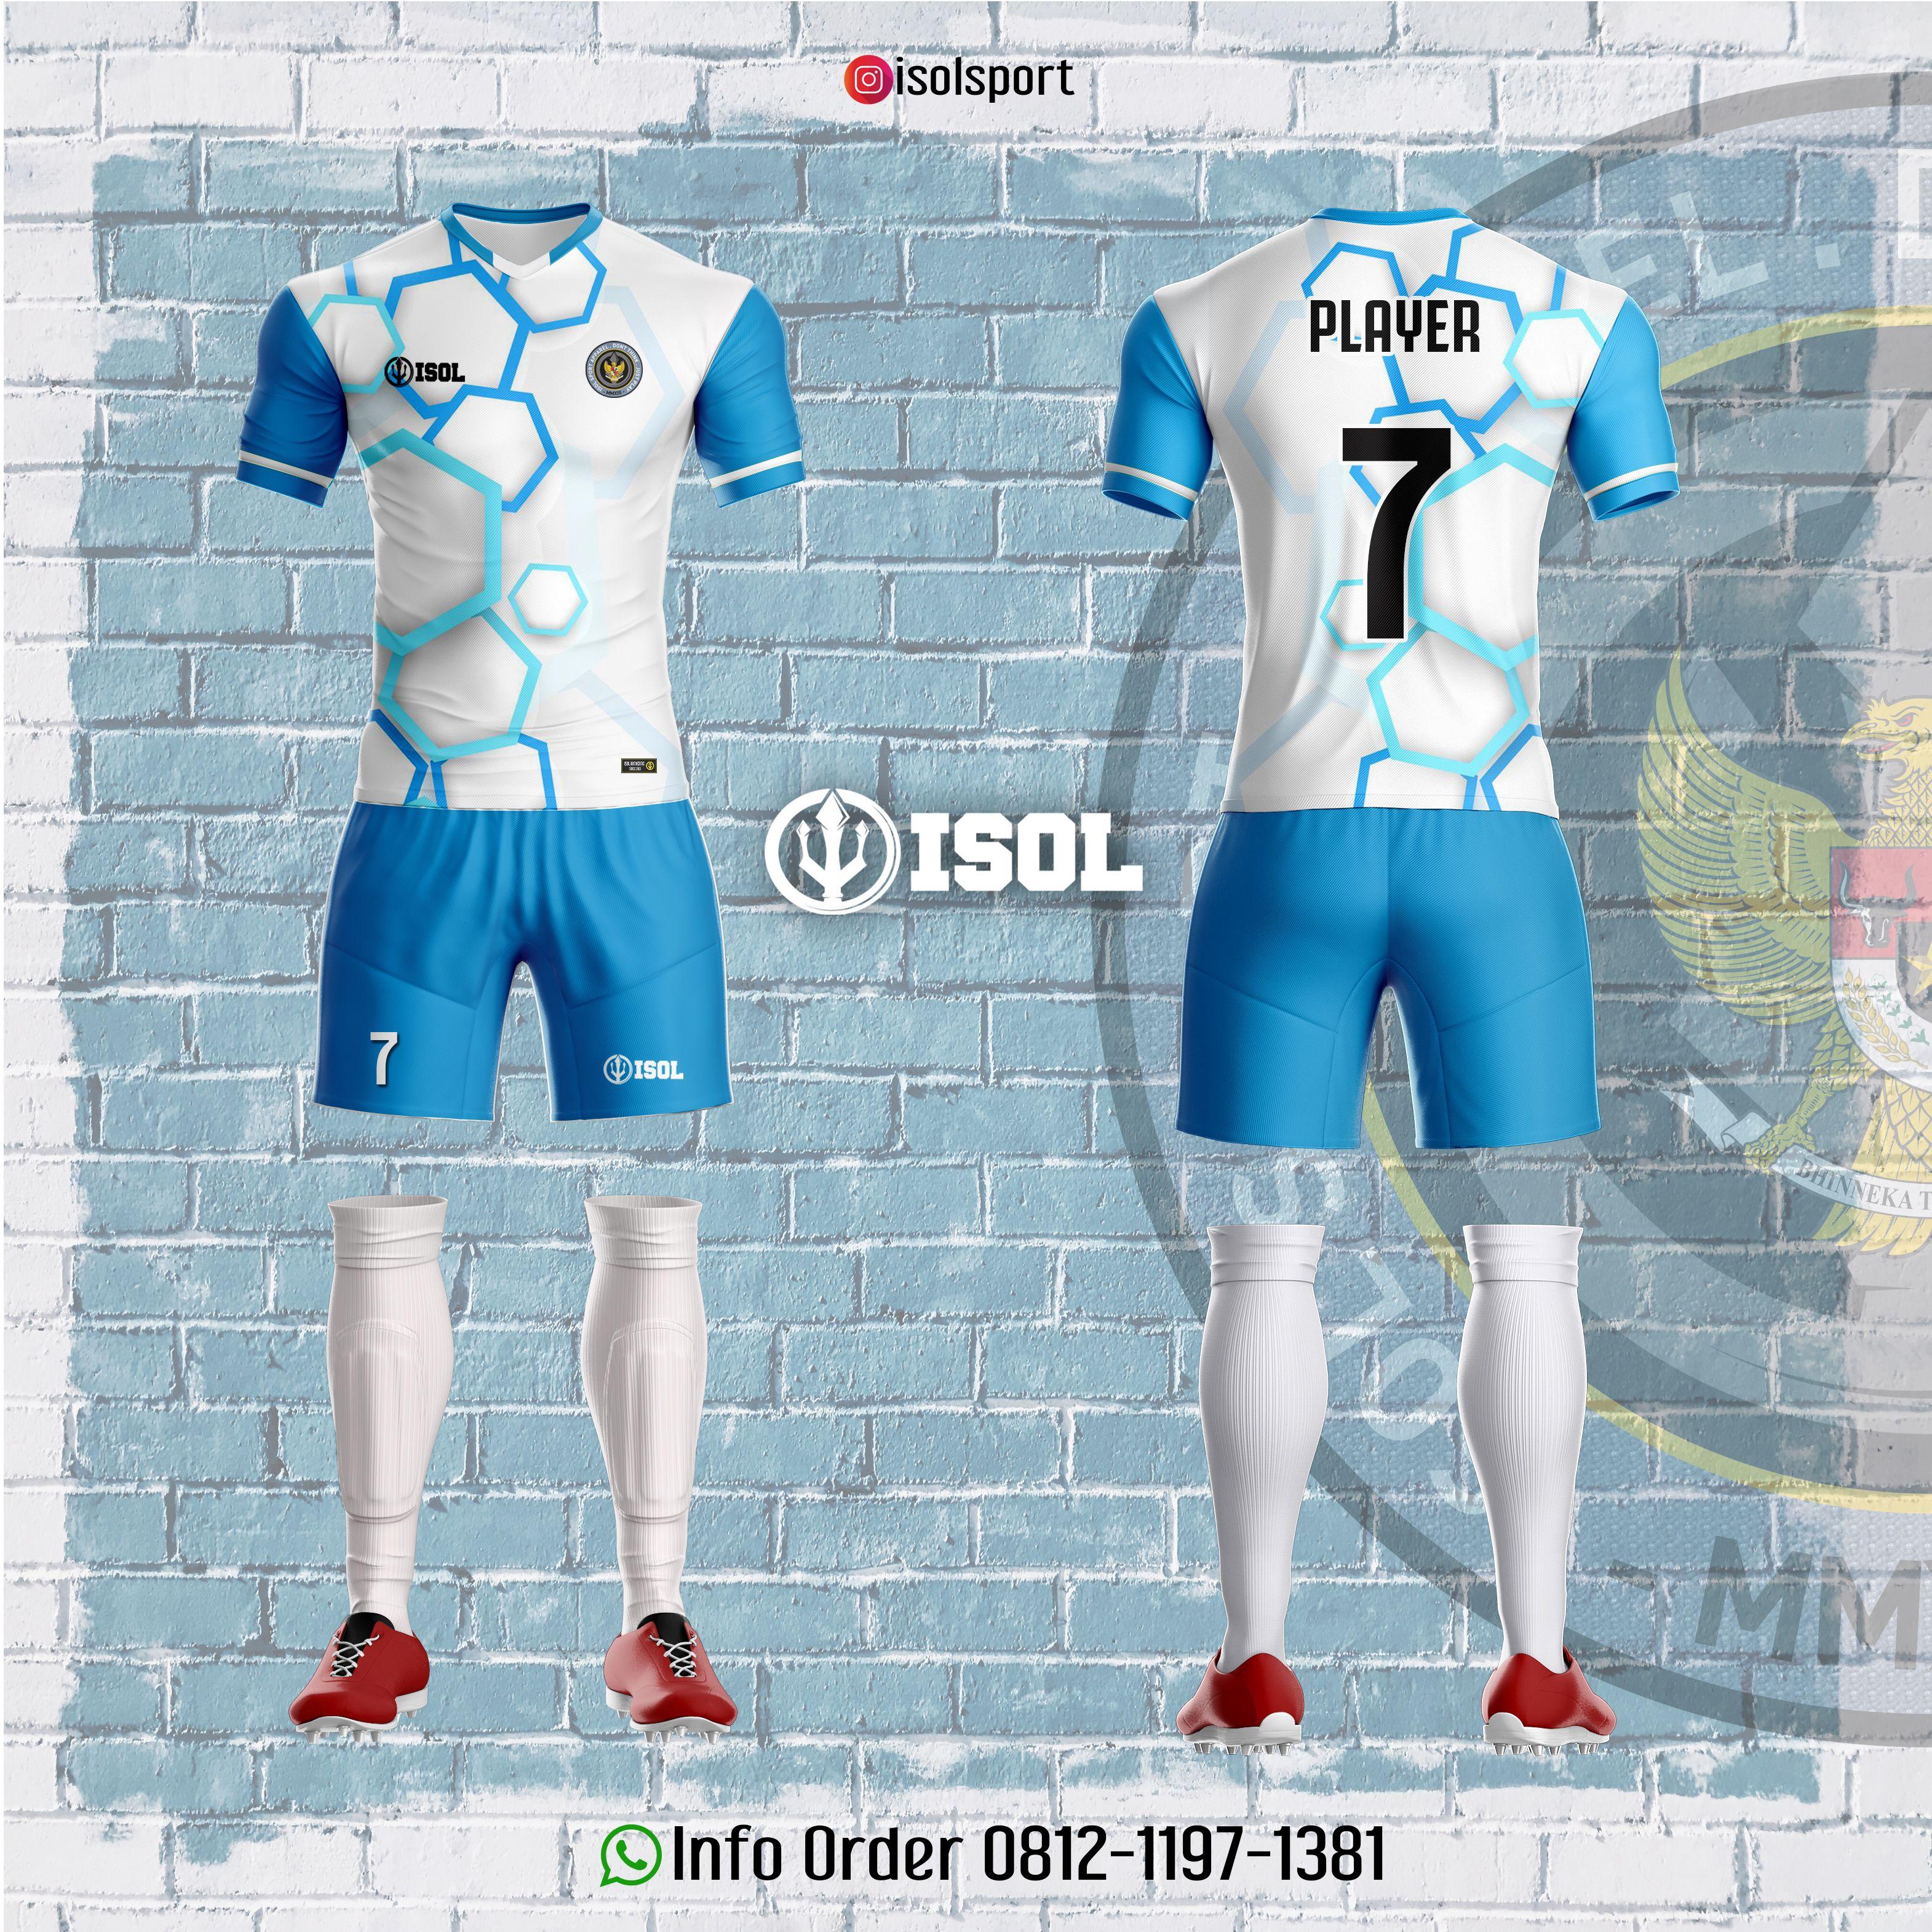 Download Desain Jersey Futsal Isolsport Kaos Kostum Desain